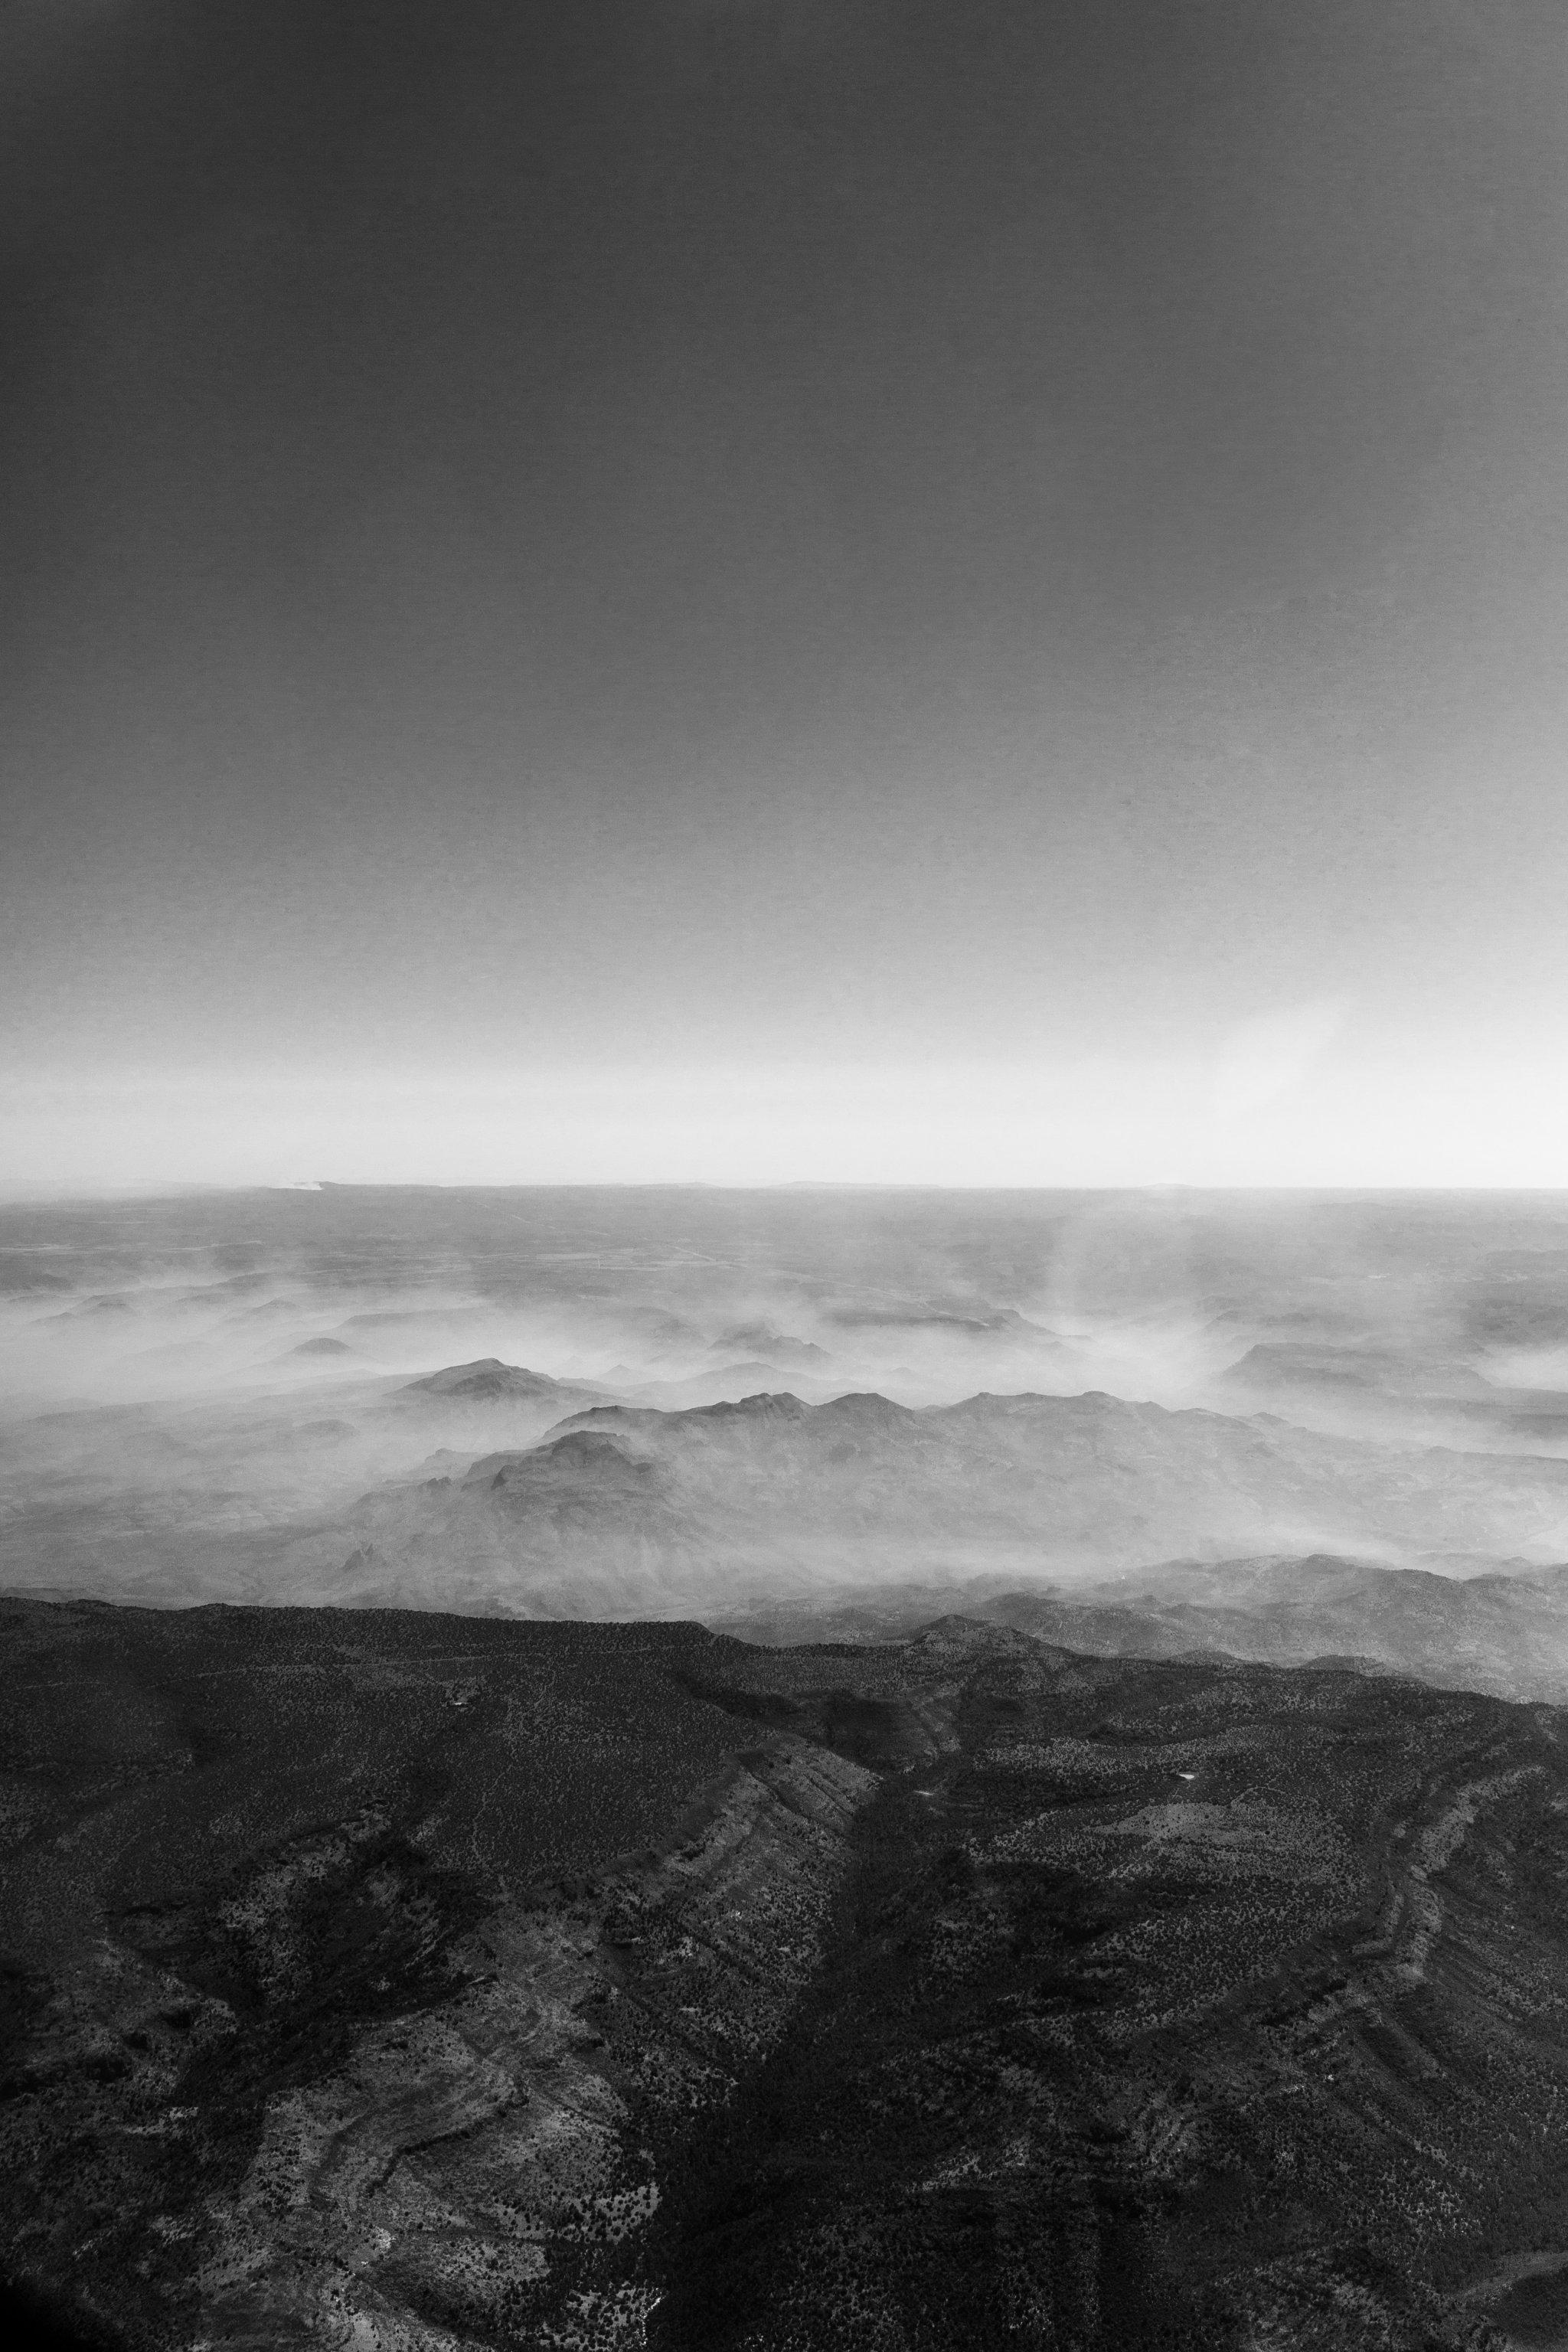 black and white photo of hazy Arizona mountains from a plane